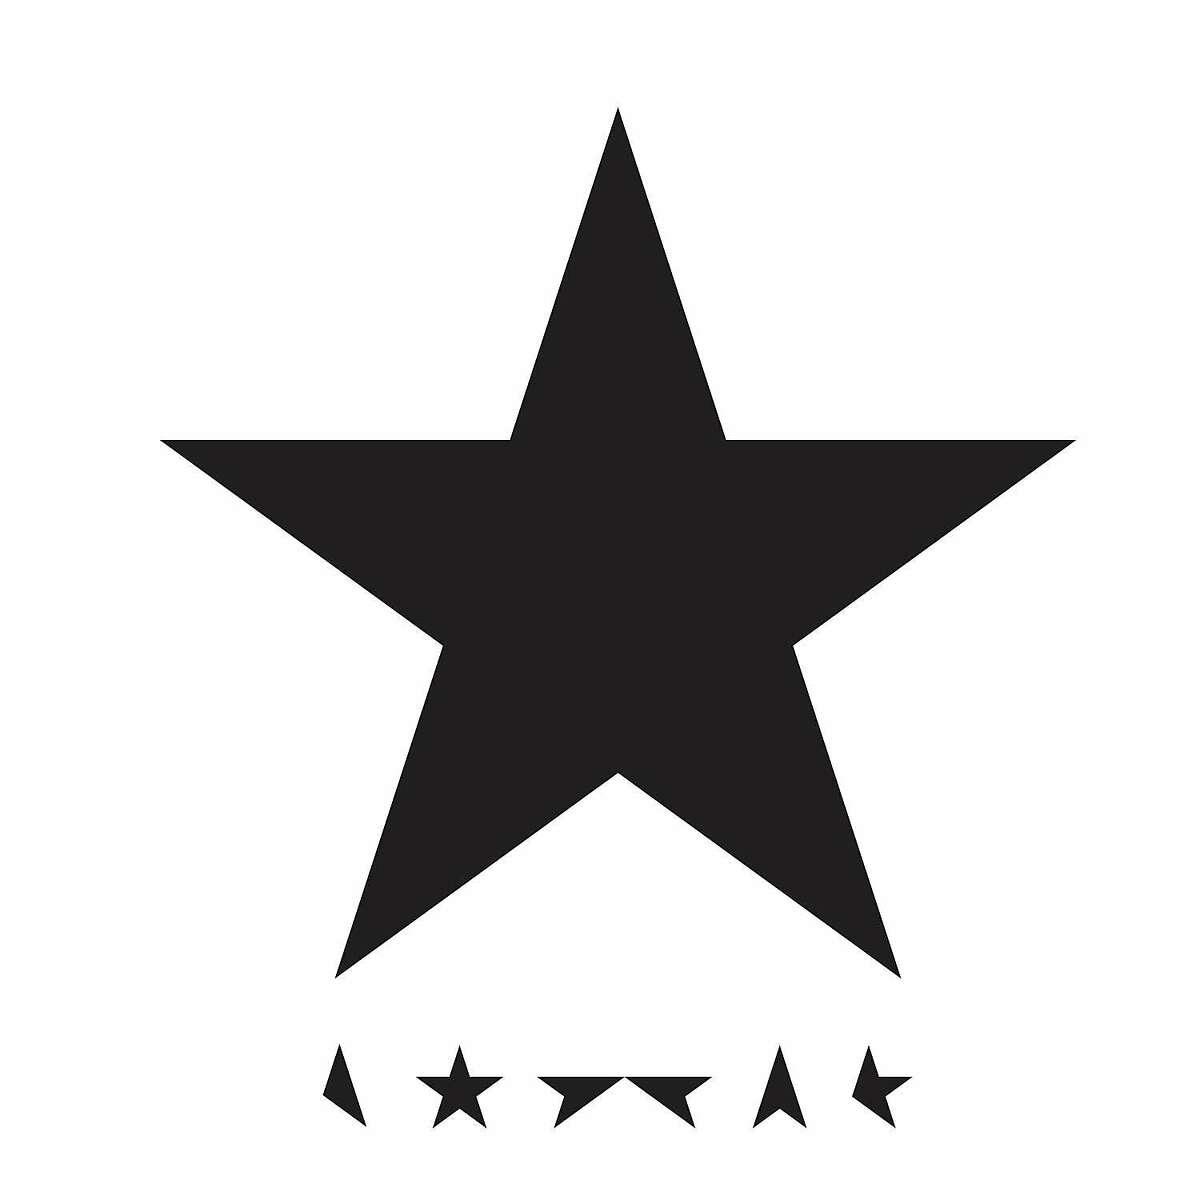 David Bowie, 'Blackstar'